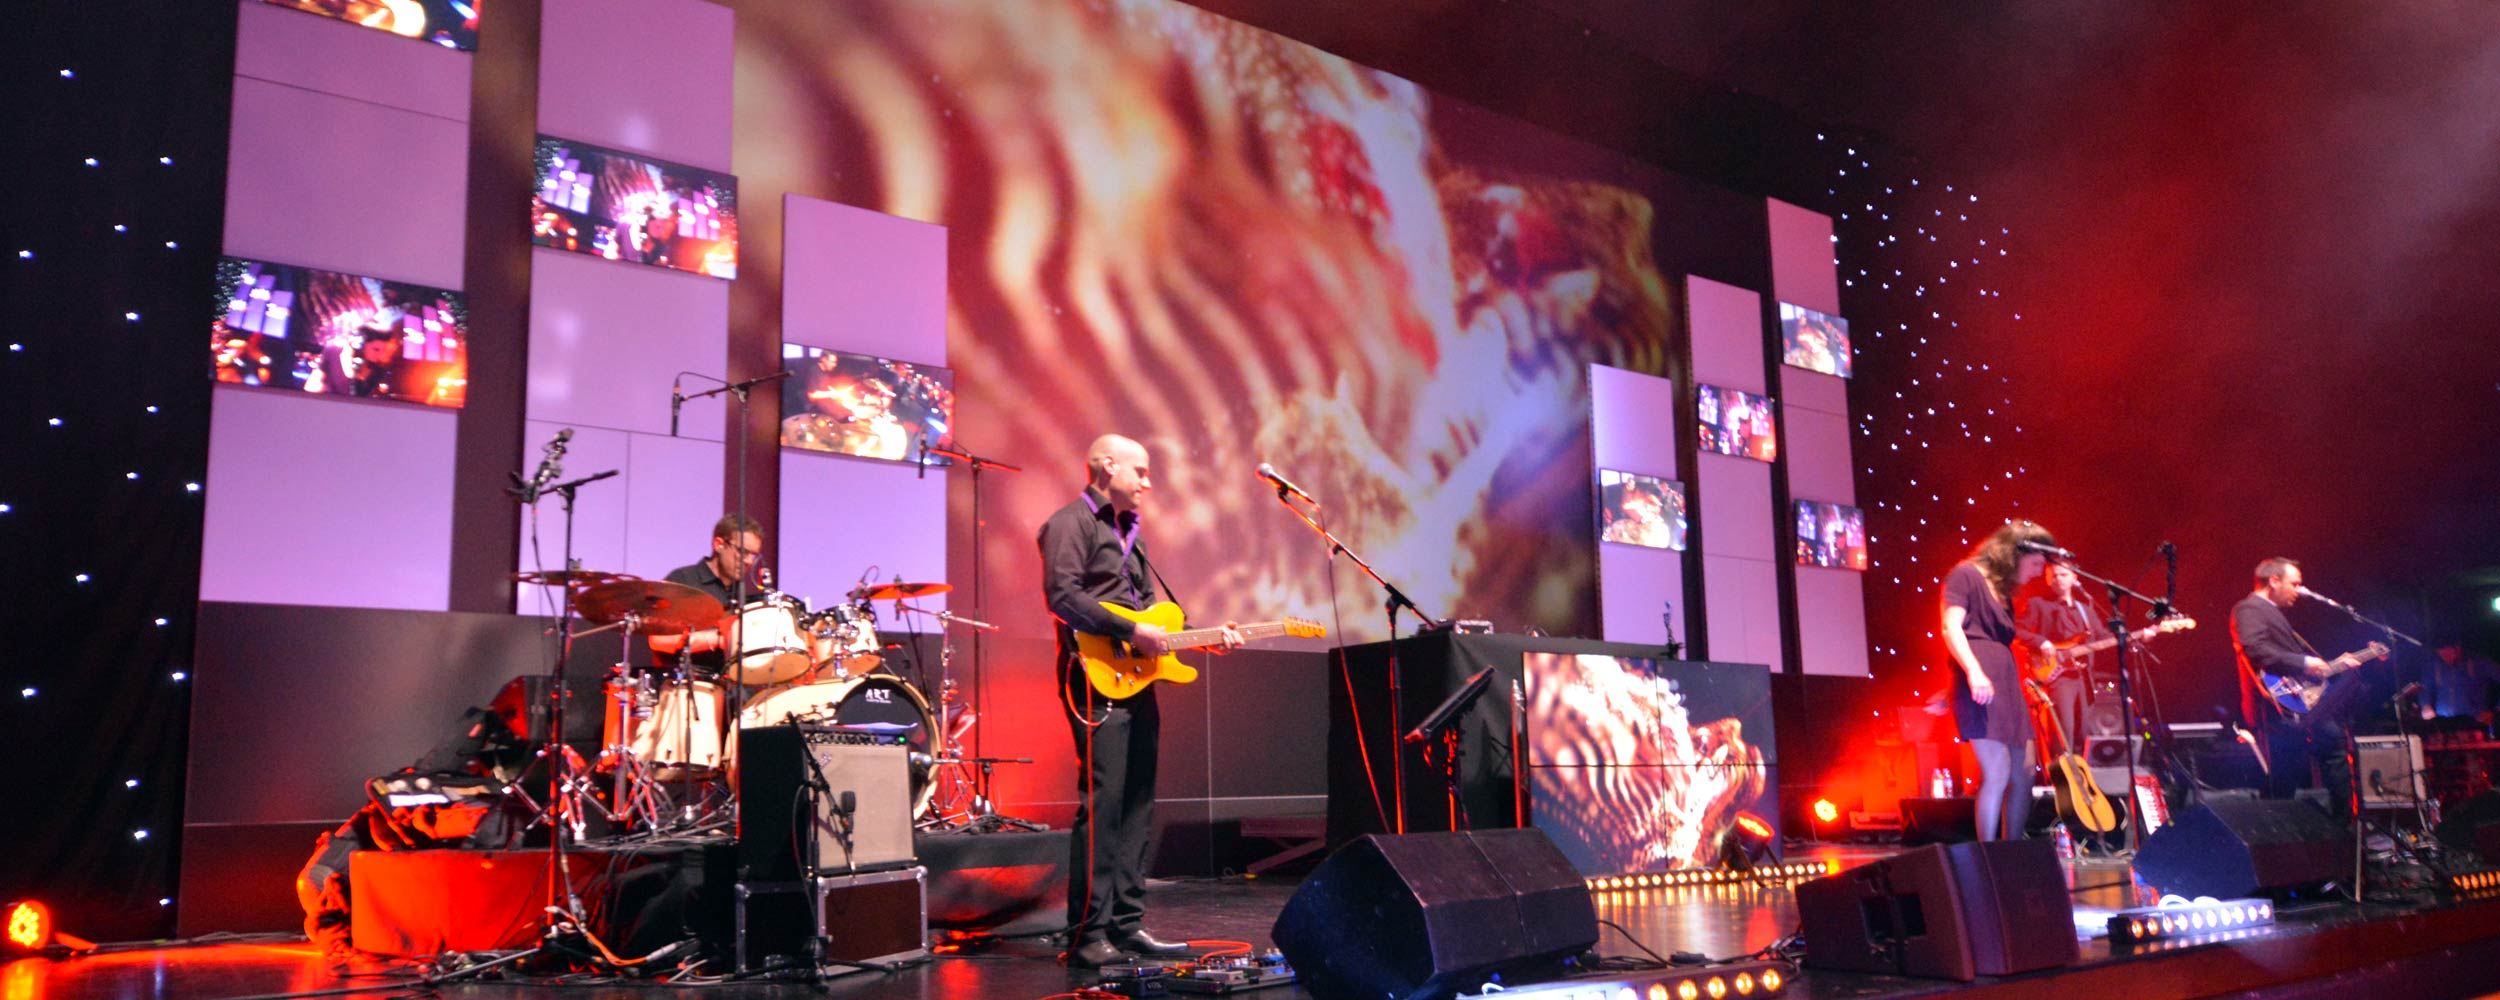 concert bandeau image 1